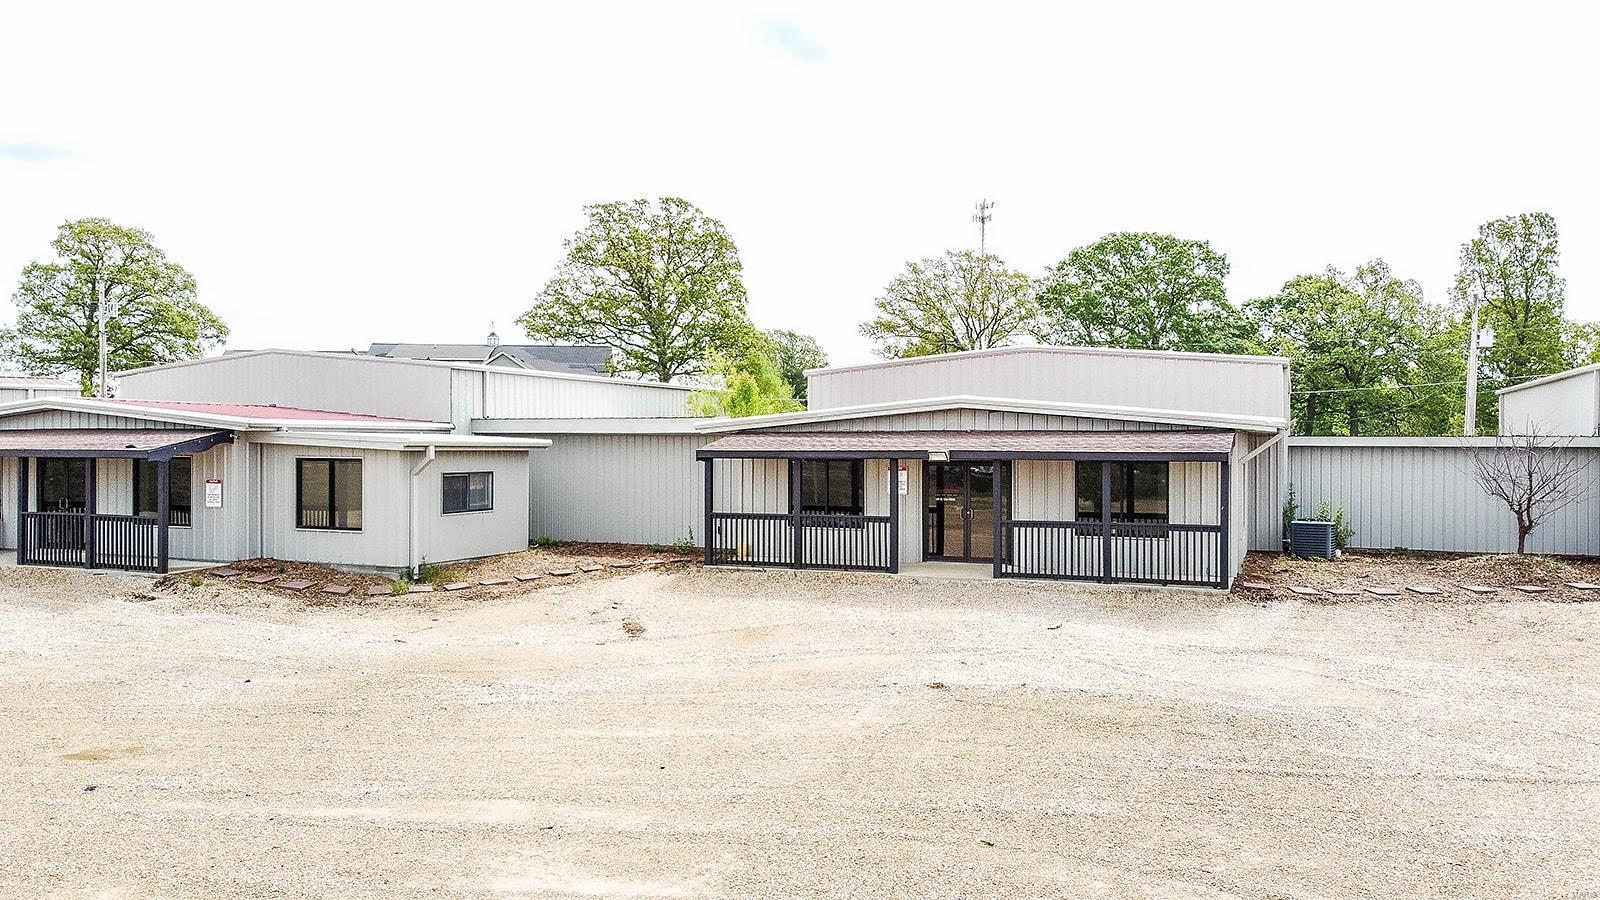 407 Schofer St Property Photo - Doolittle, MO real estate listing